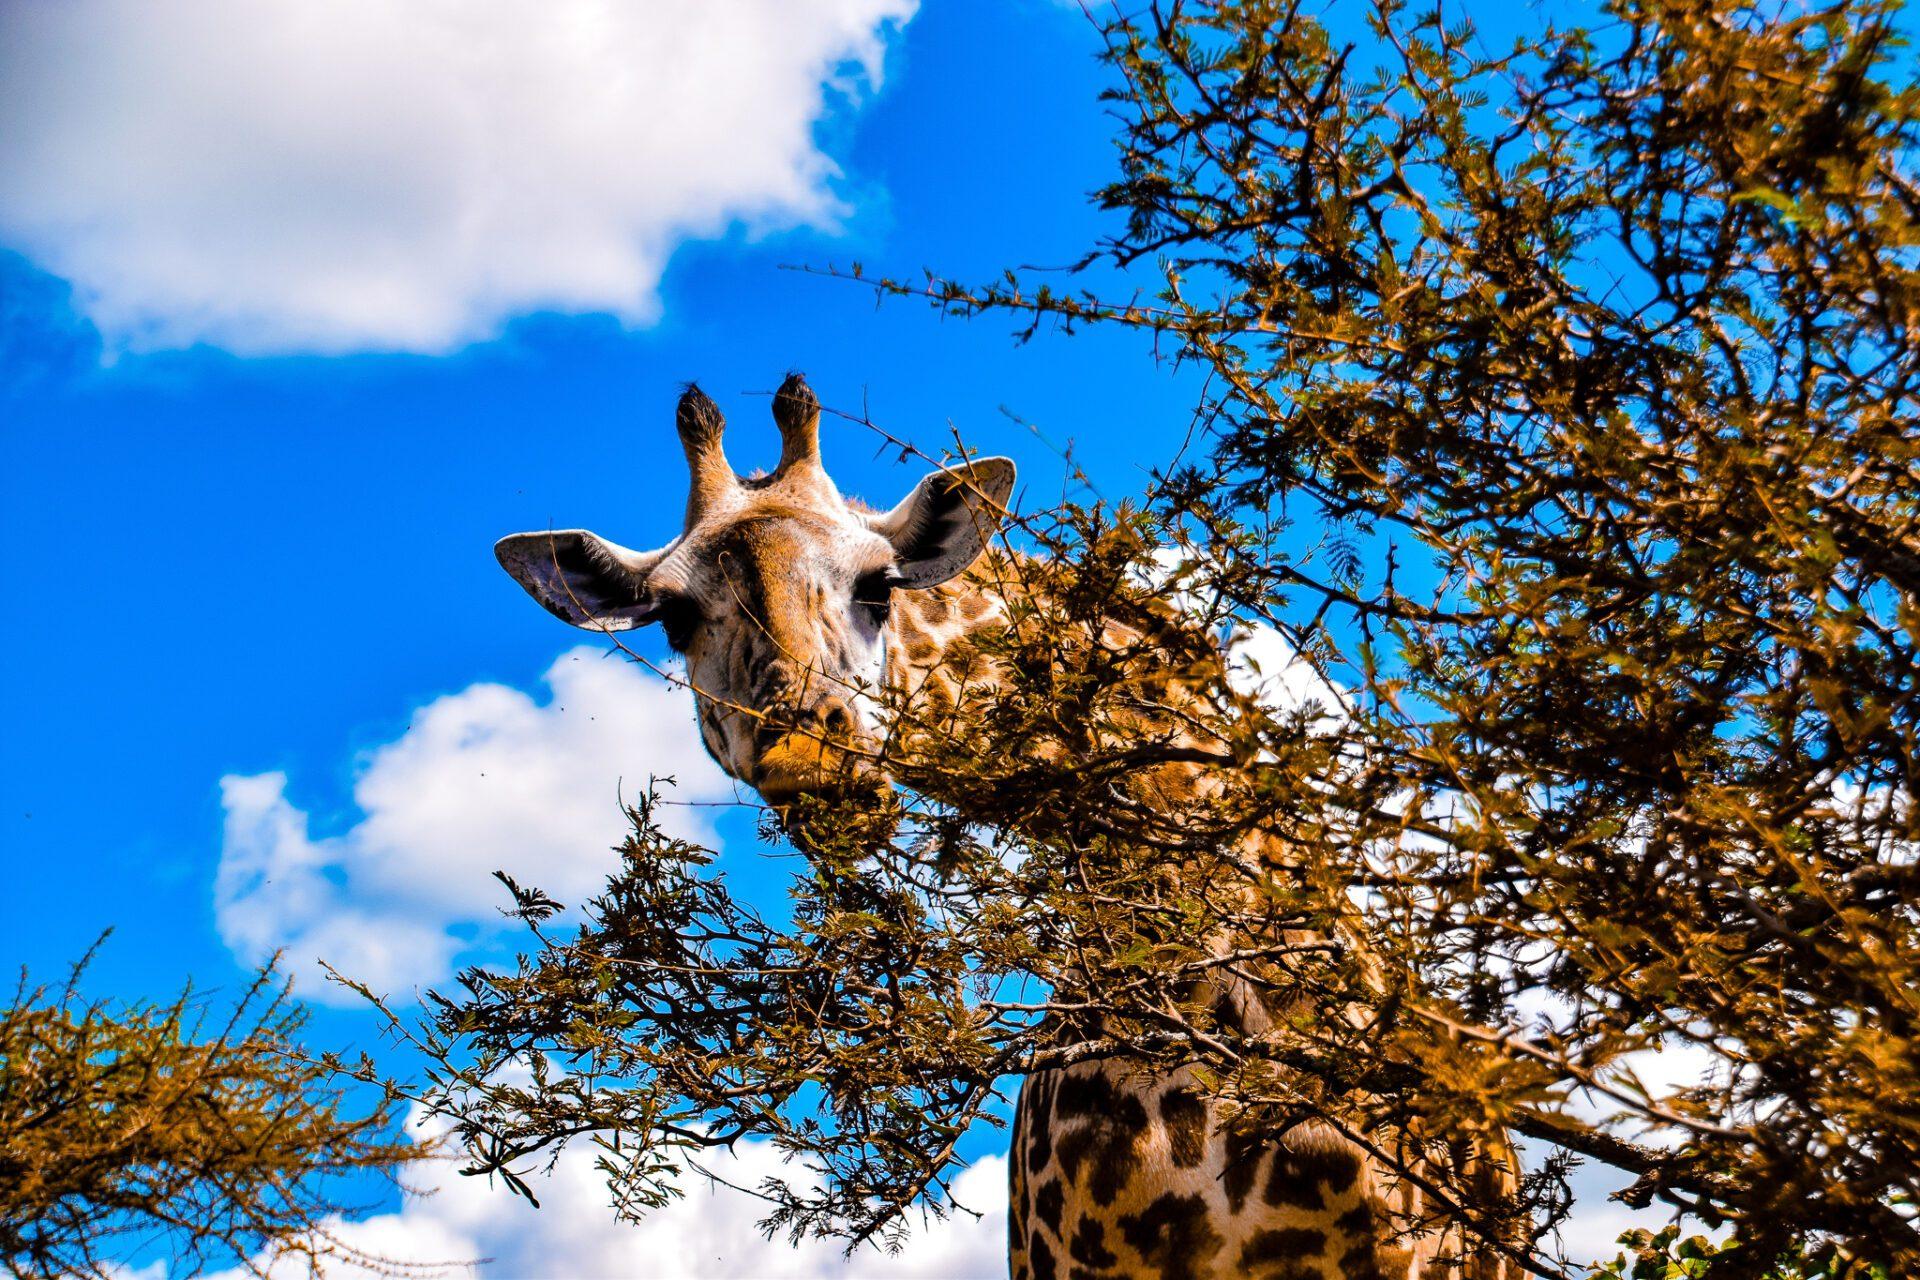 Giraf spiser af træ lige over person Serengeti safari Tanzania